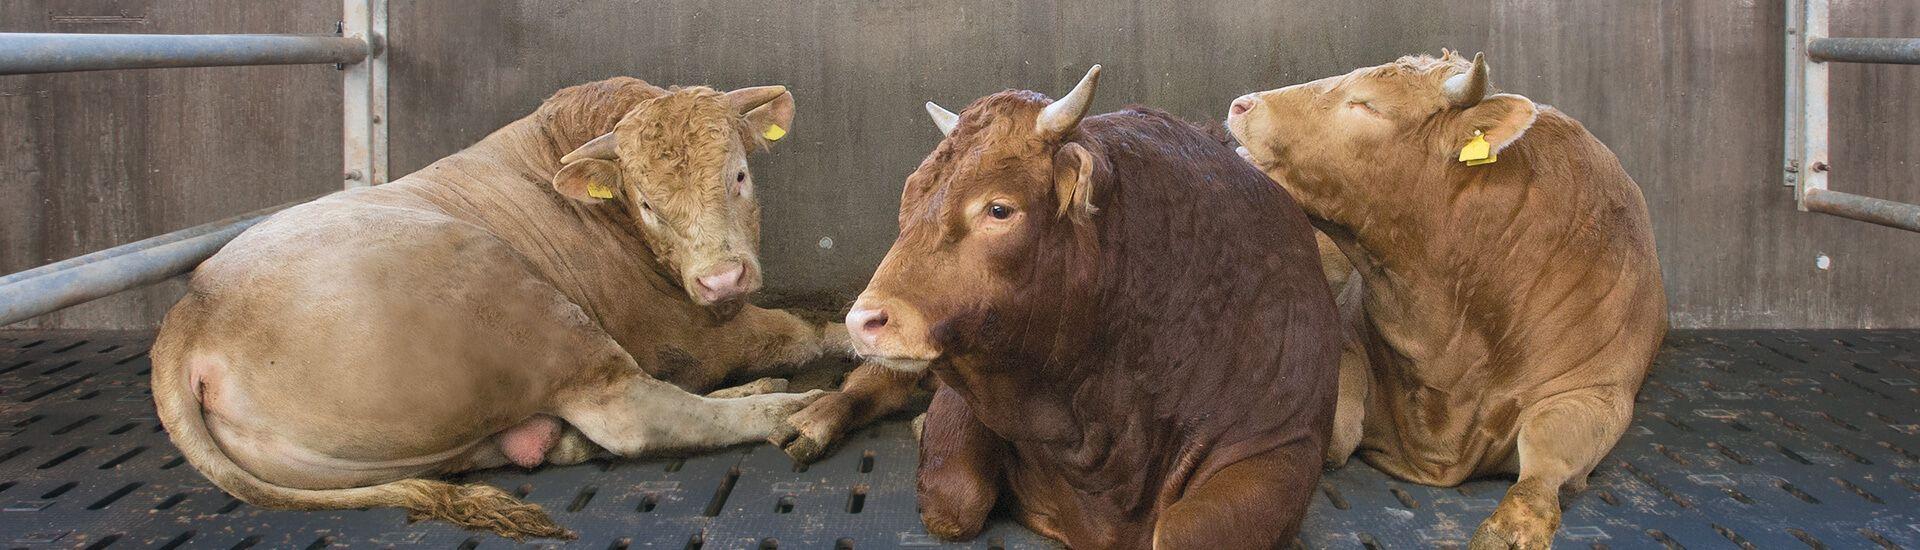 Soft rubber floorings for fattening bulls: healthier animals, better weight gain